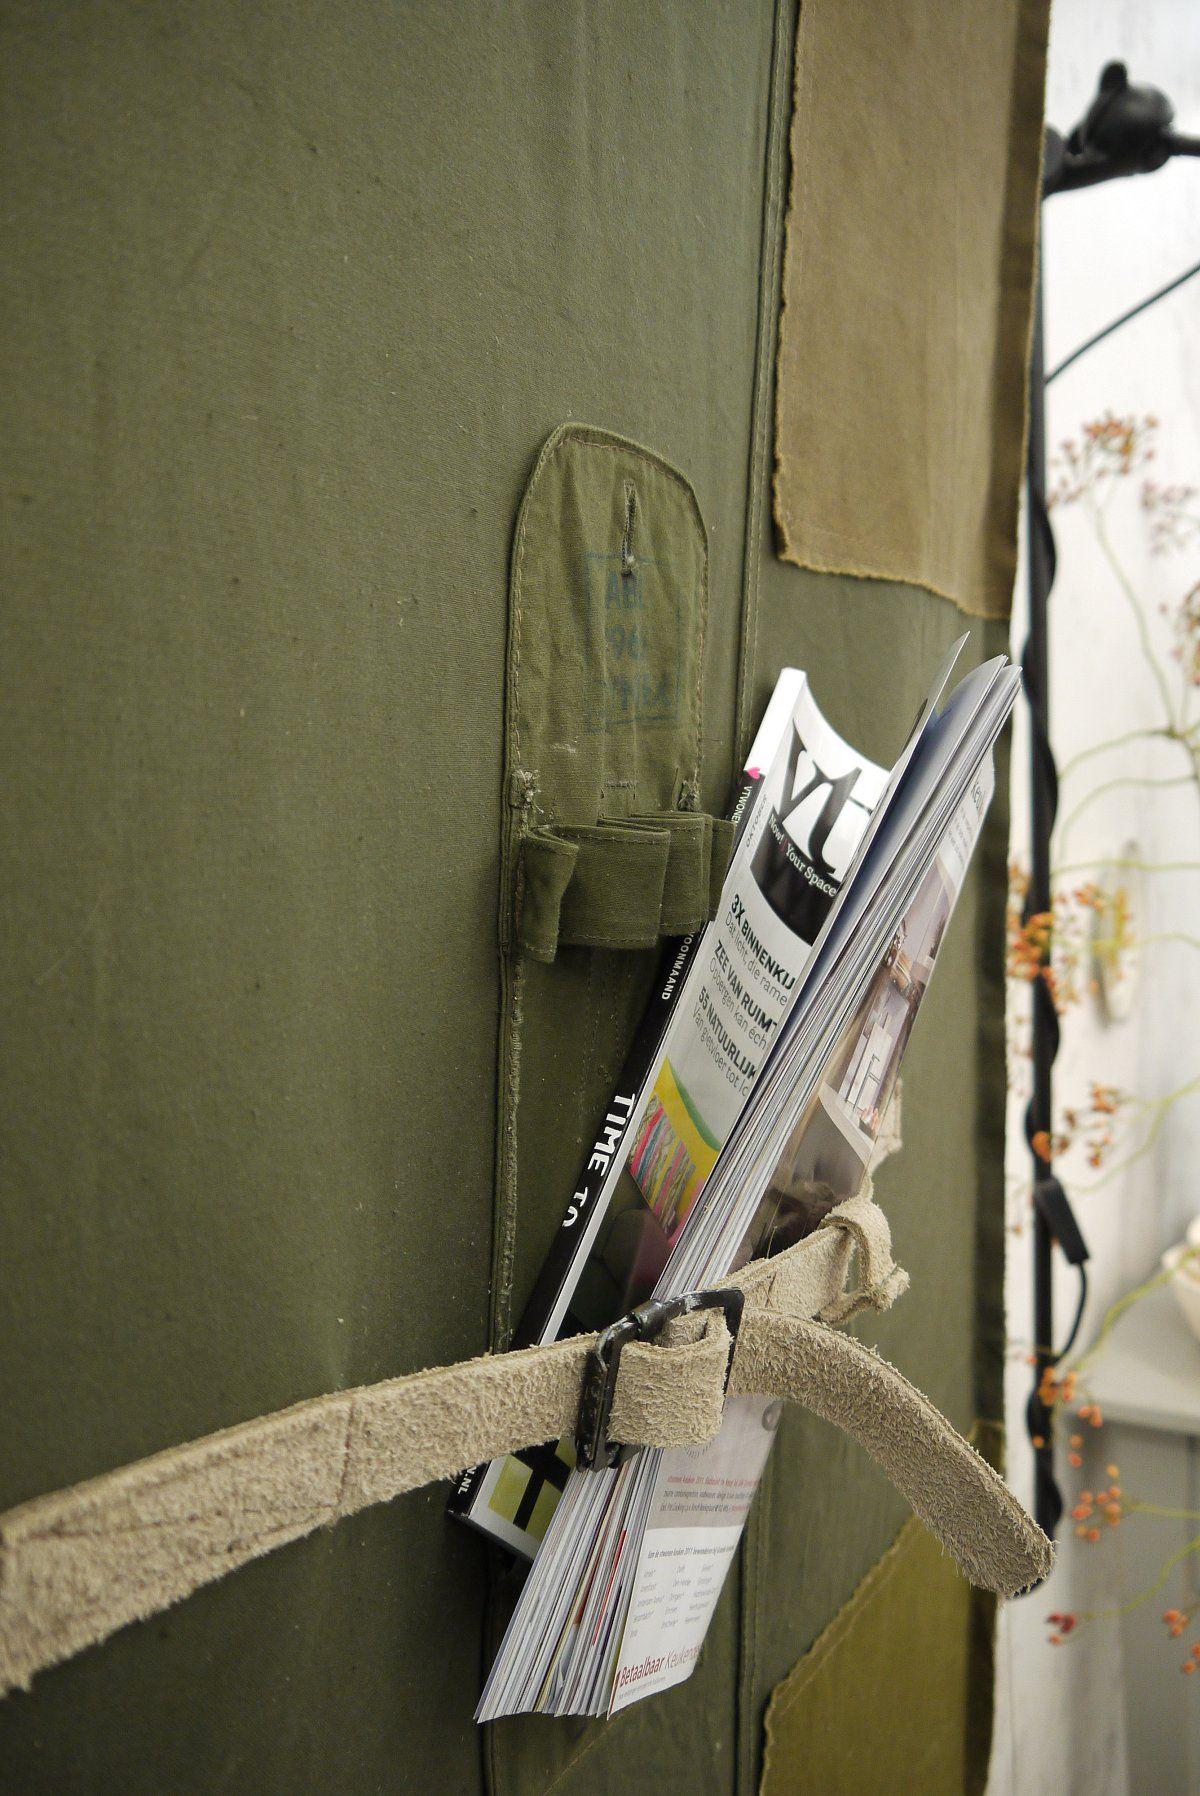 Restoration Hardware Marseilles Chair Swivel Glides C Vosgesparis Blogspot An Living Room In The Vt